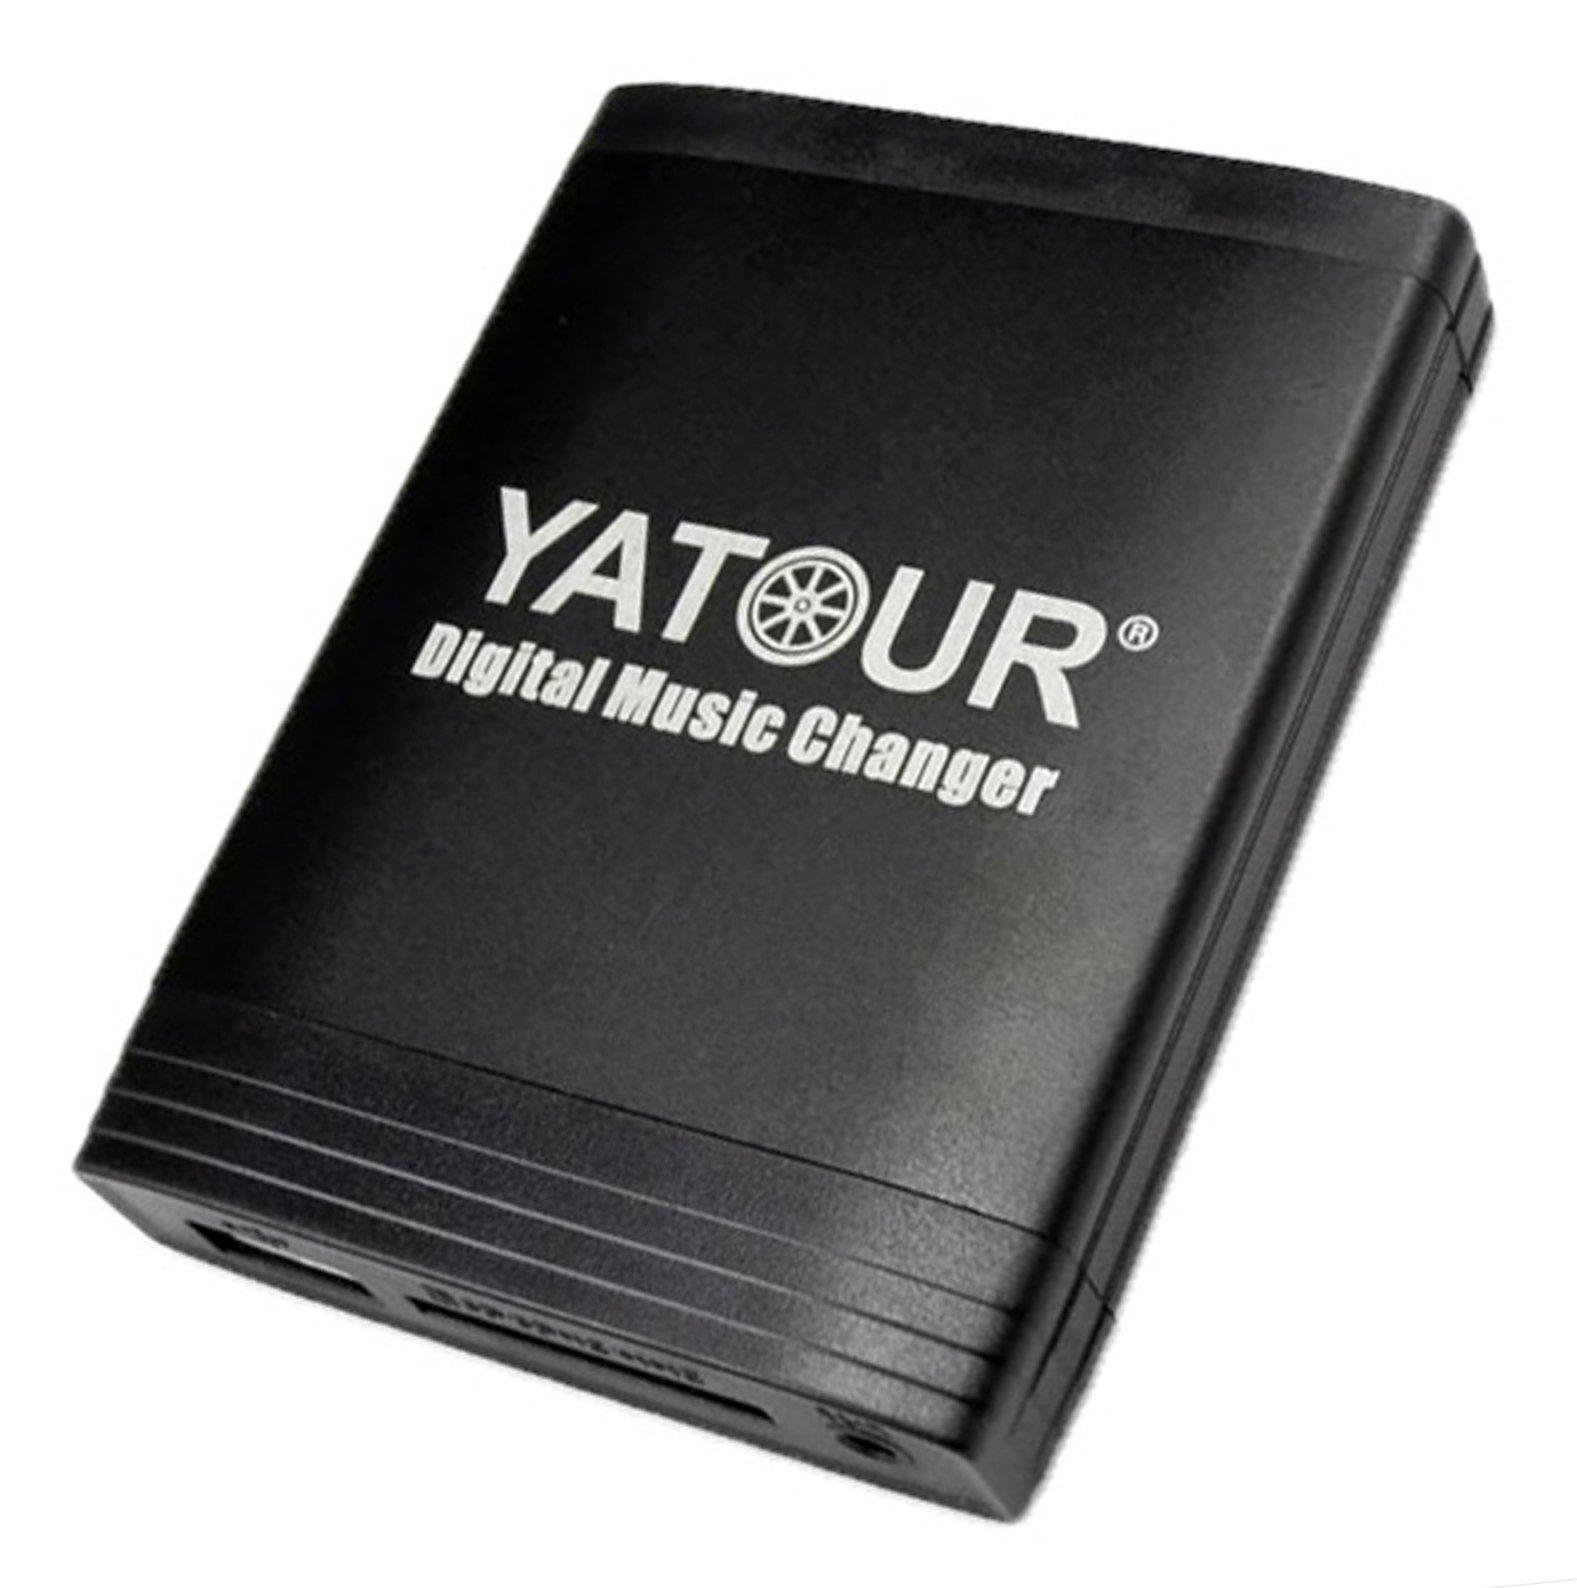 YATOUR adattatore interfaccia USB AUX per OPEL SD